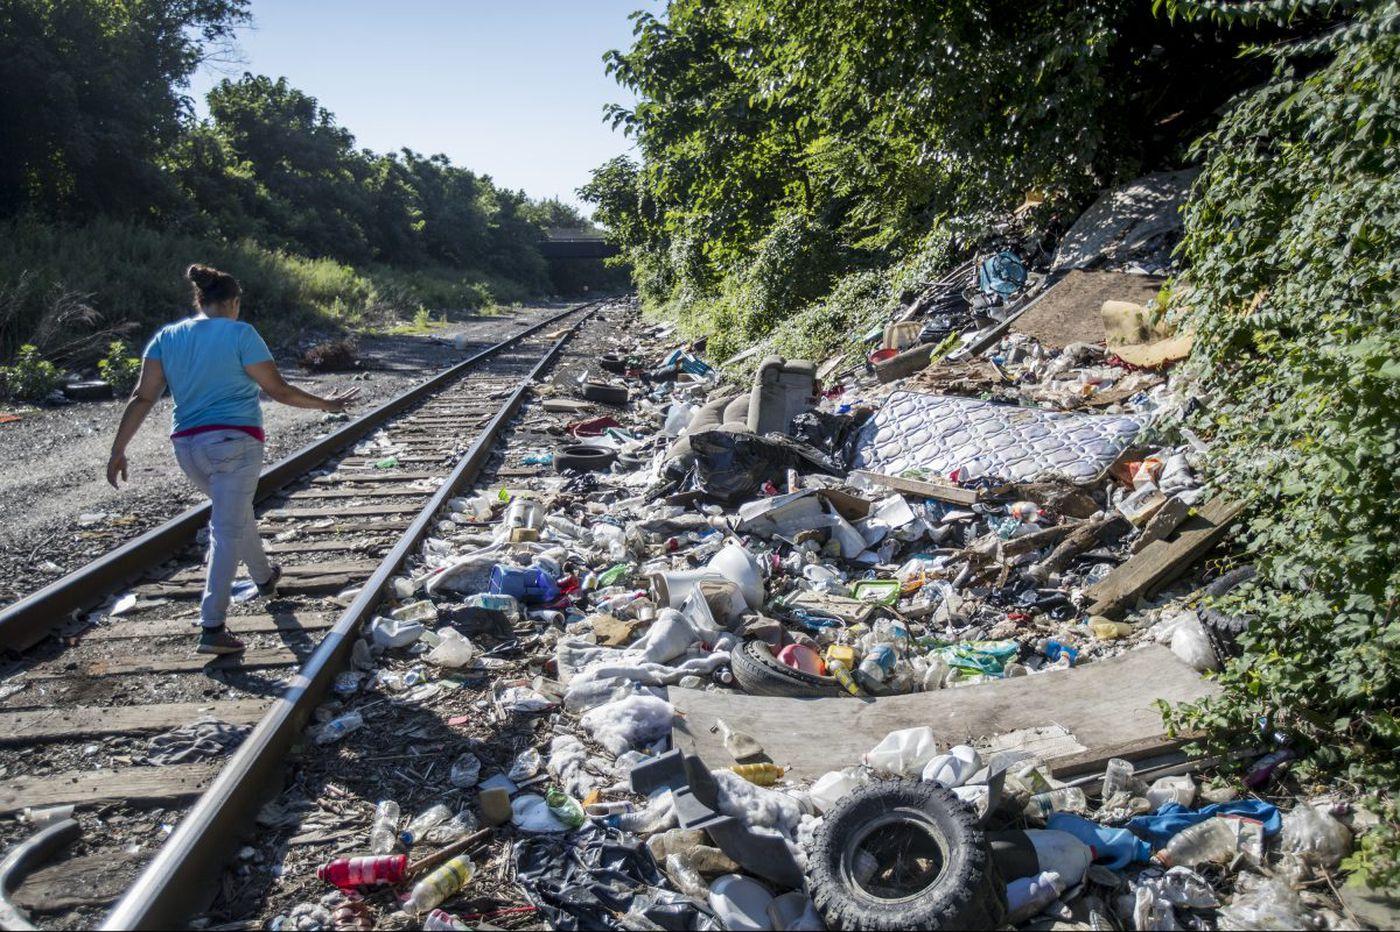 'A big step': Cleanup of Gurney Street heroin camp begins